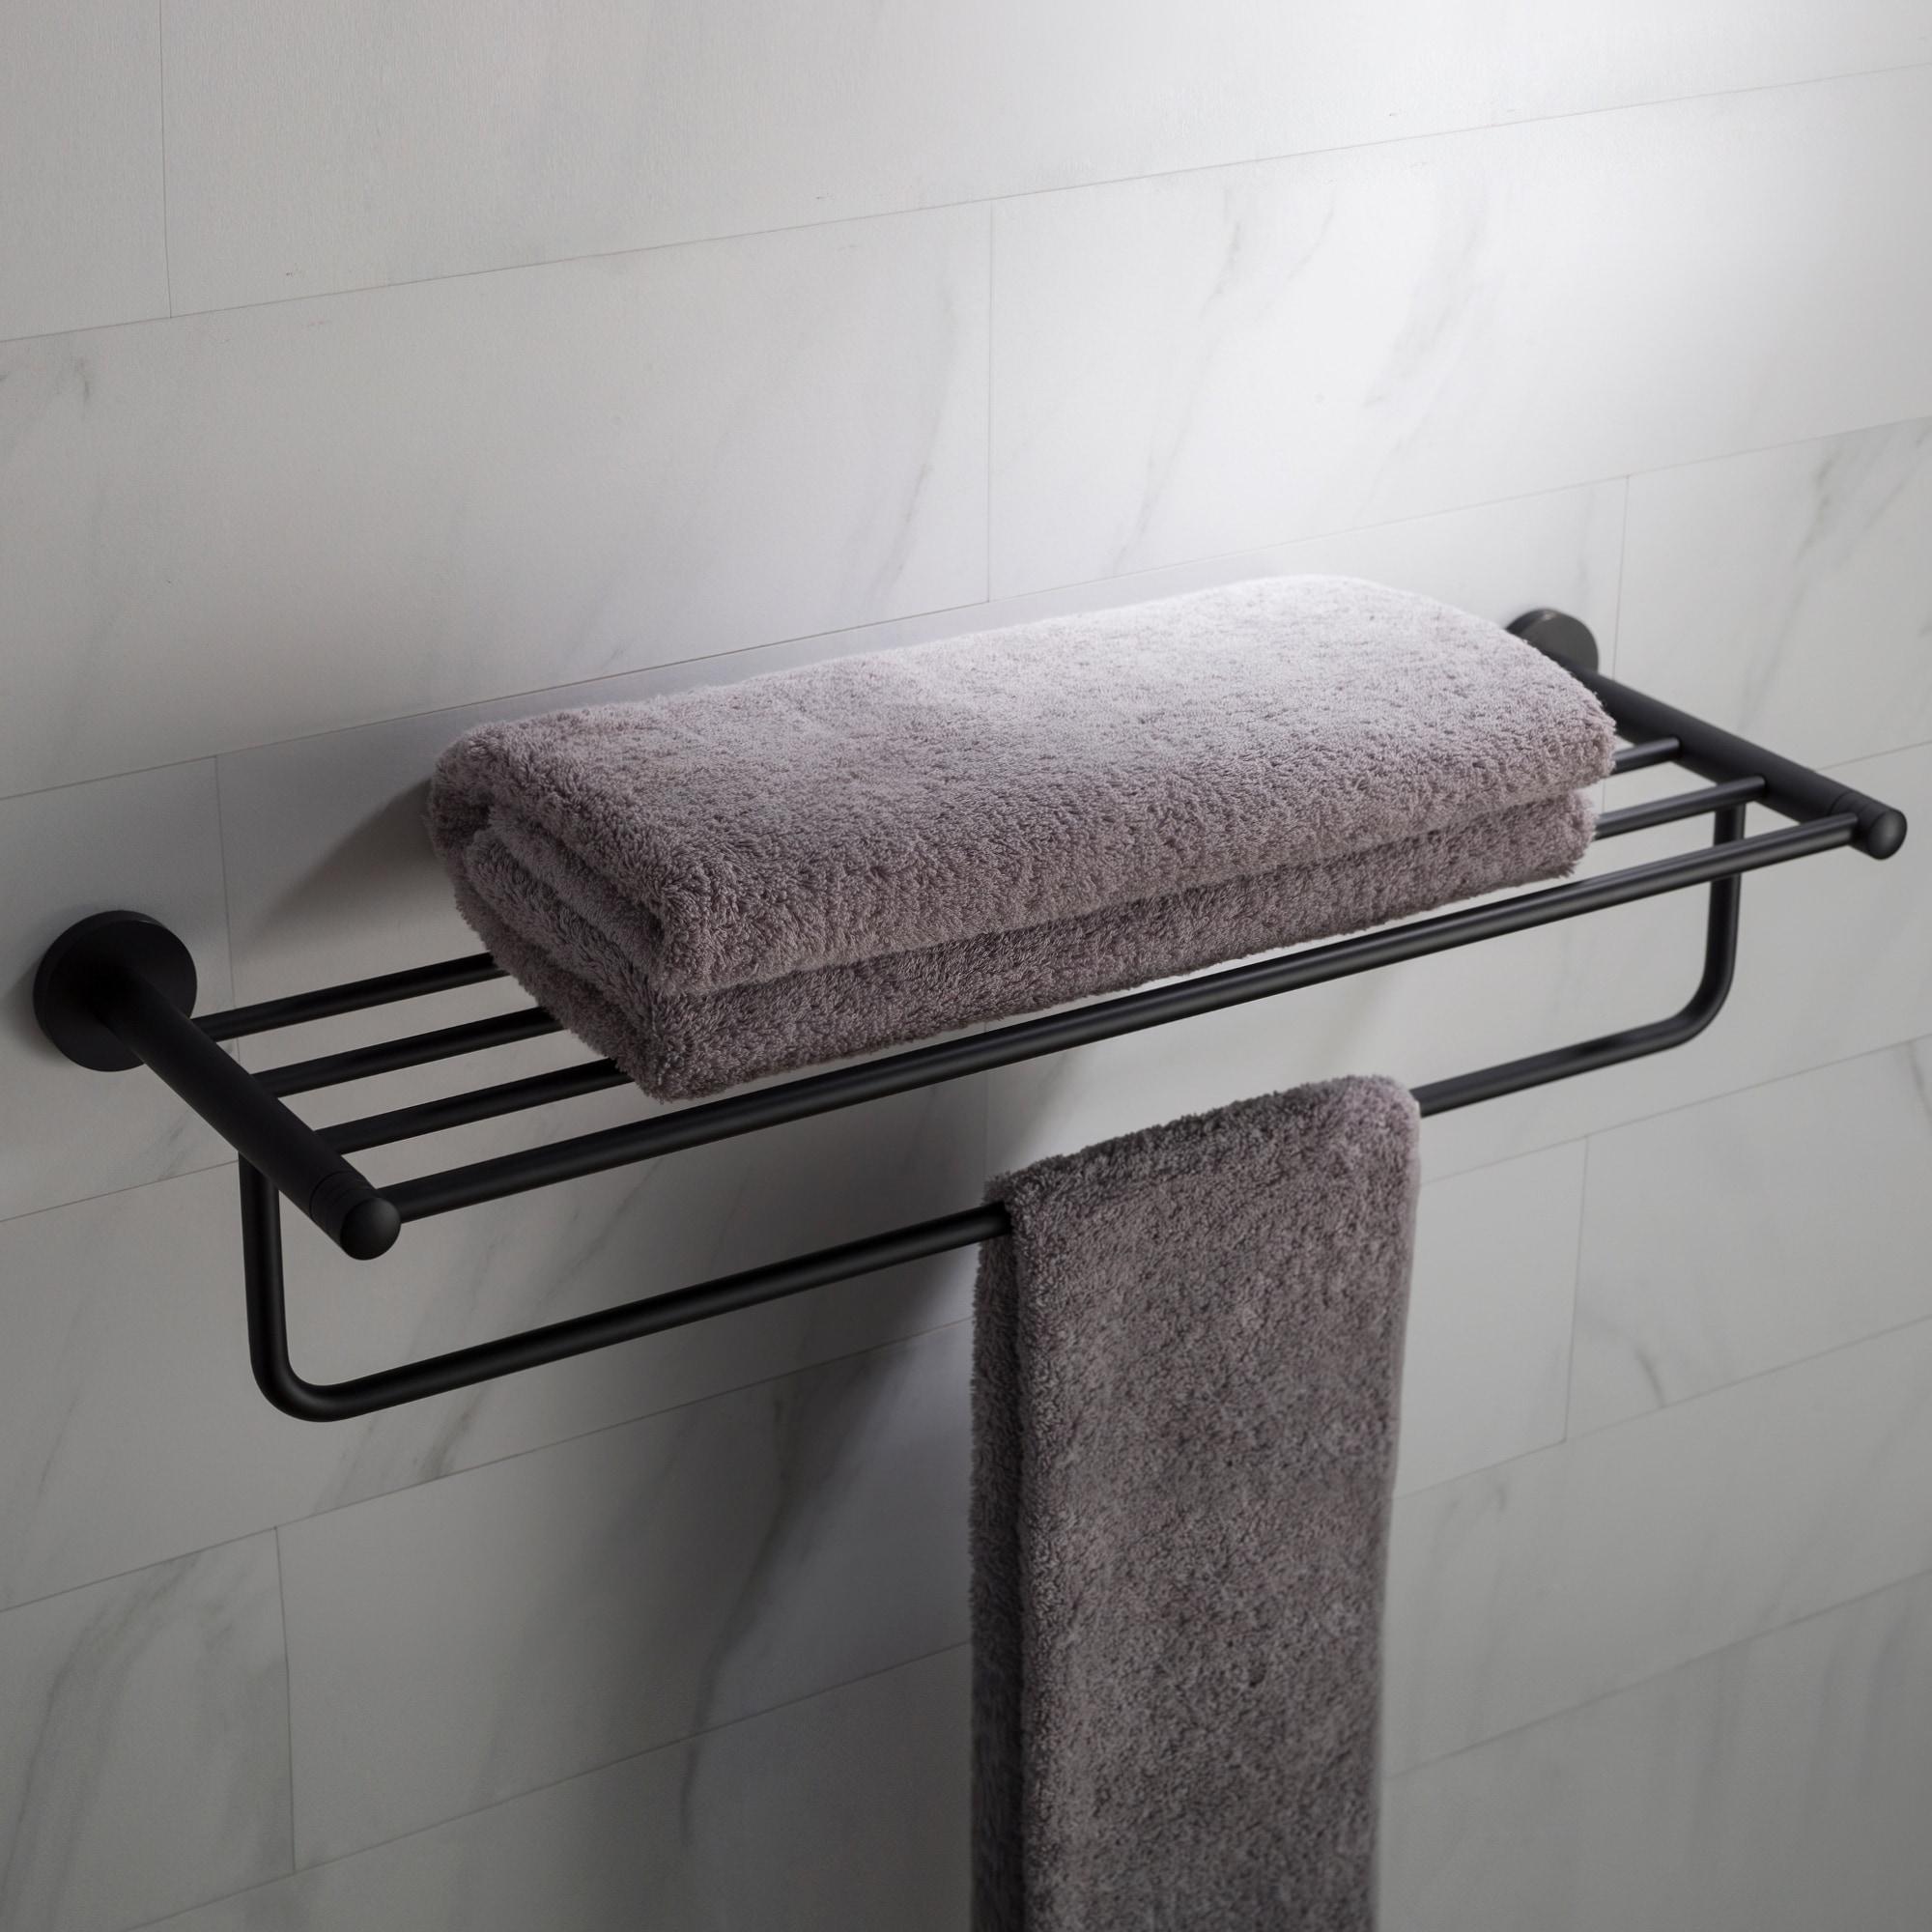 KRAUS Elie KEA 18842 Bathroom Shelf With Towel